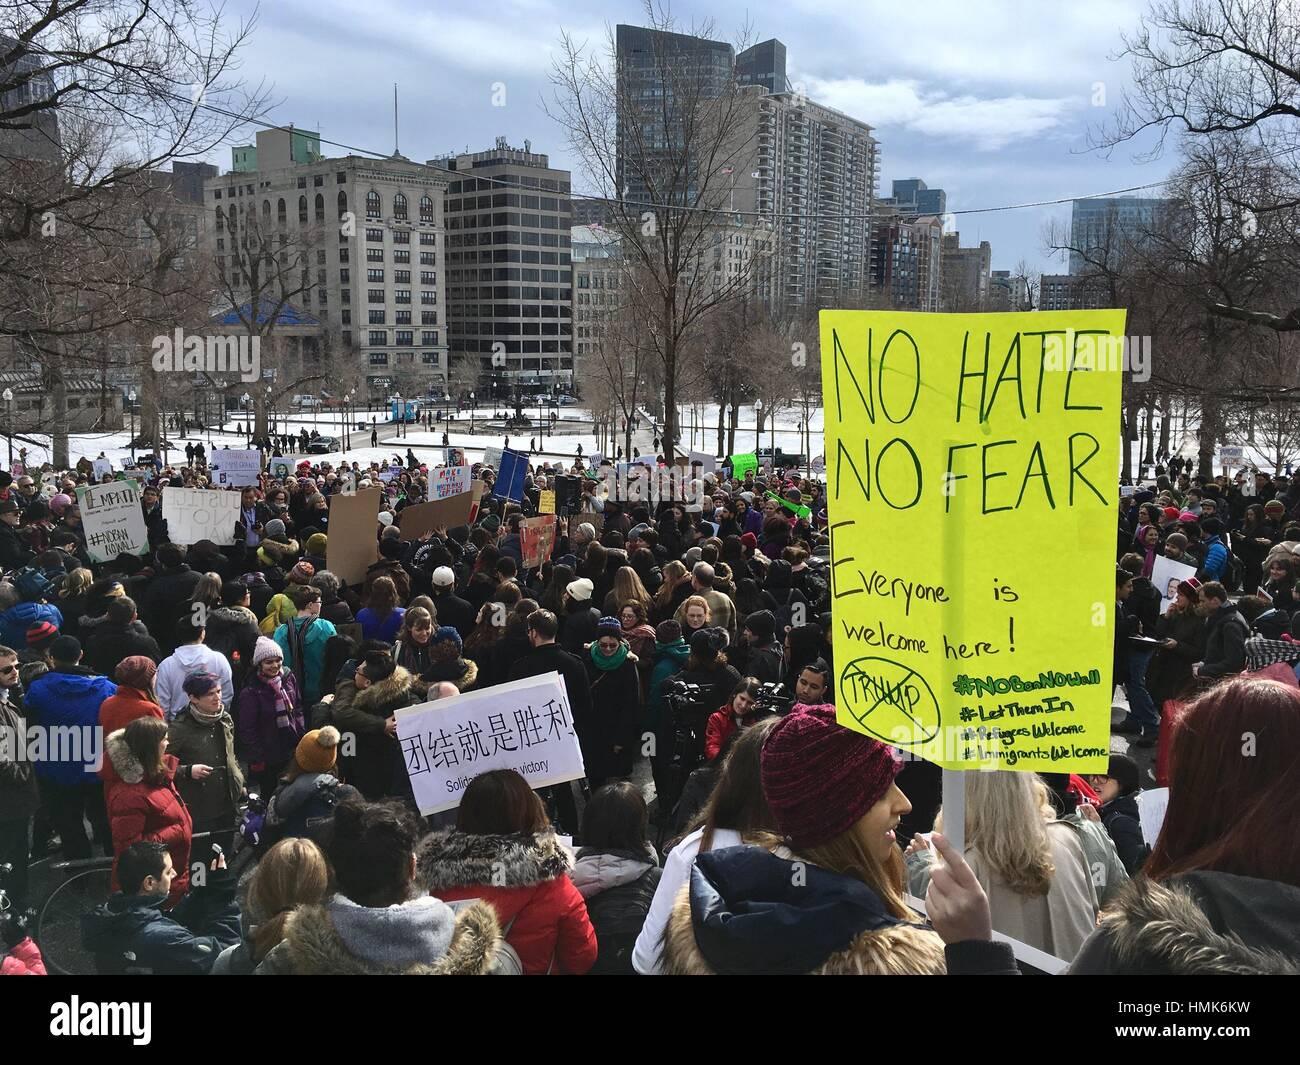 Protest against President Trump in Boston, MA, USA, 01 Feb 2017 - Stock Image